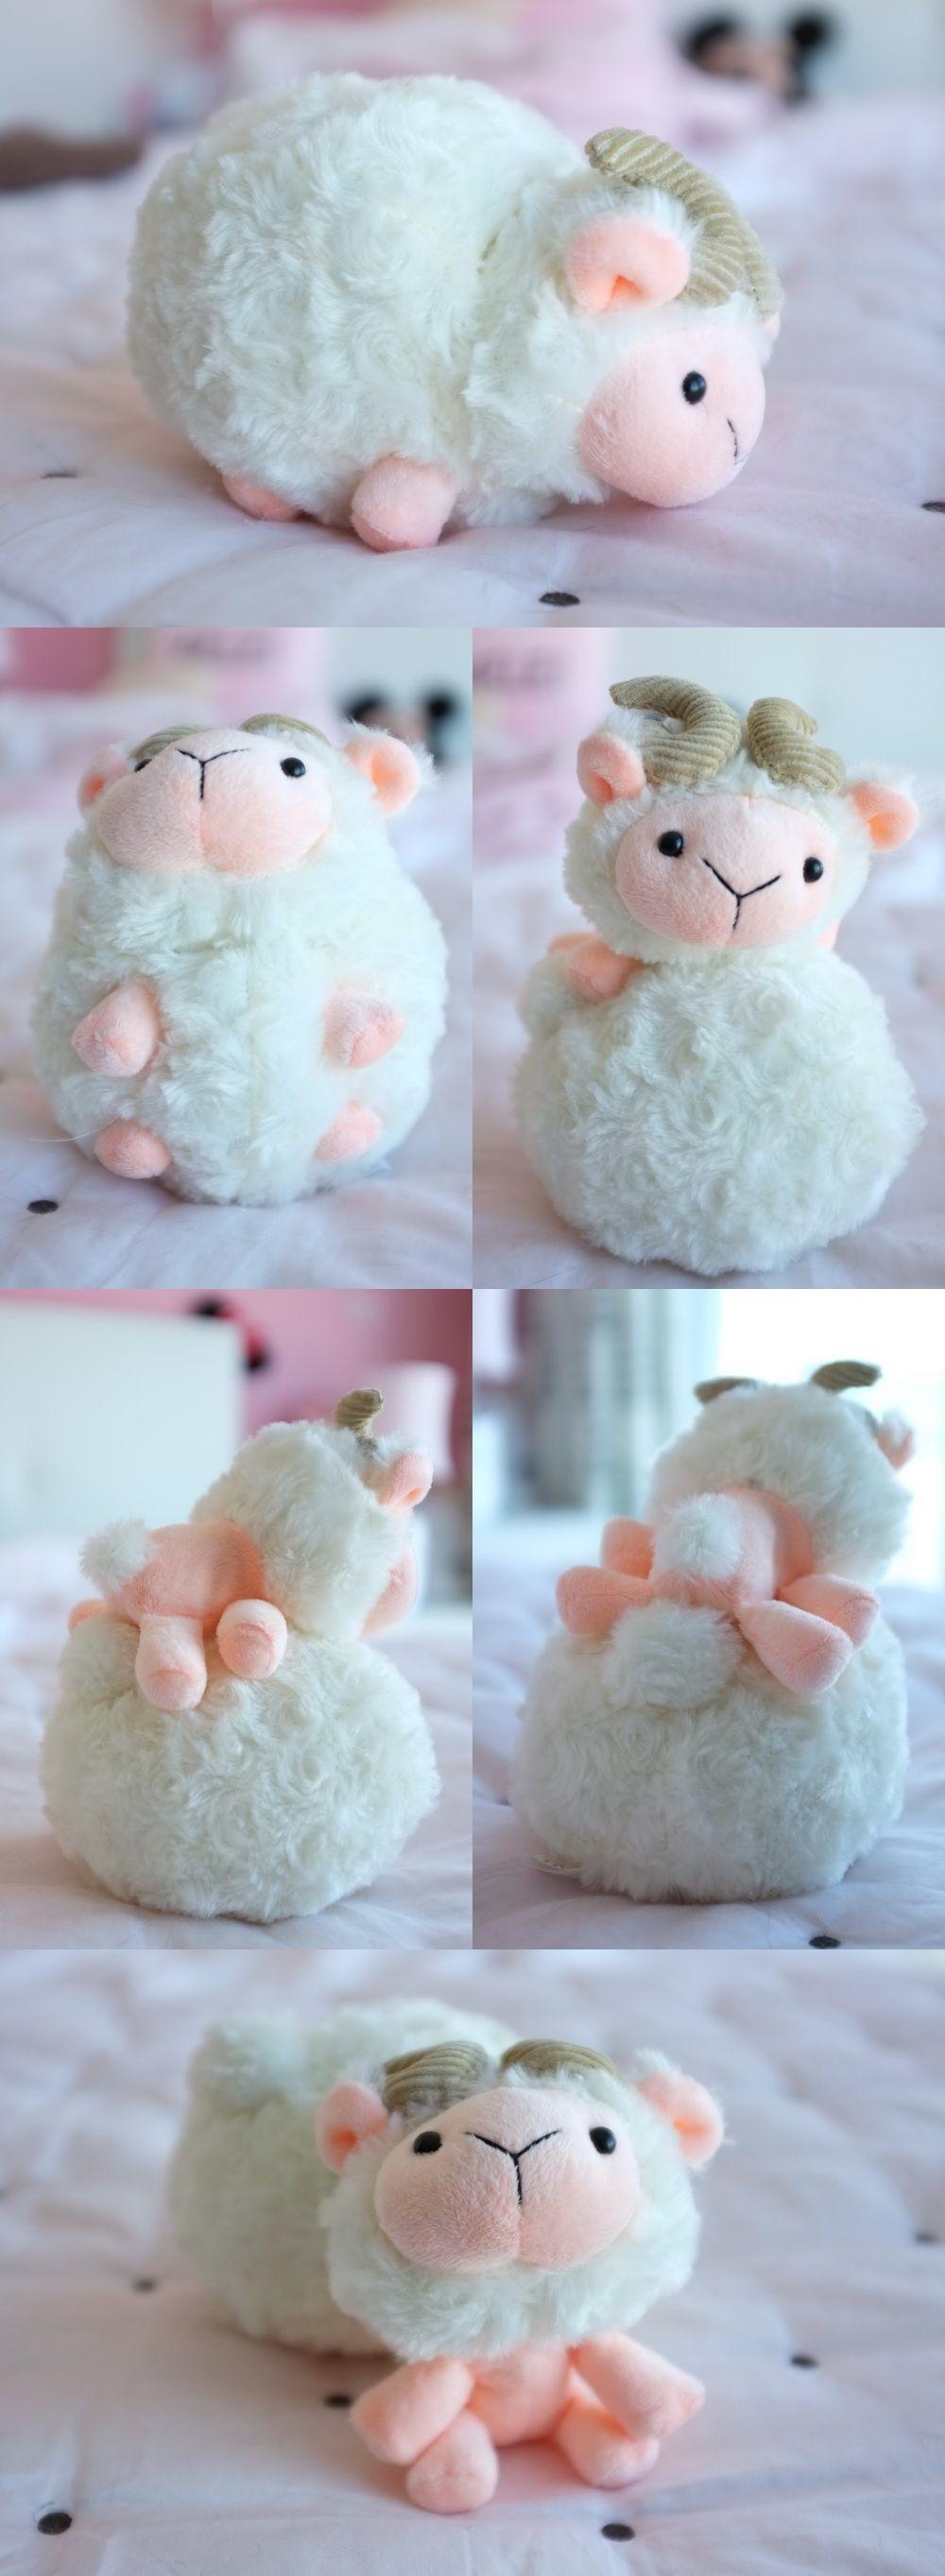 So cute! | Diy stuffed animals, Cute stuffed animals, Cute ...